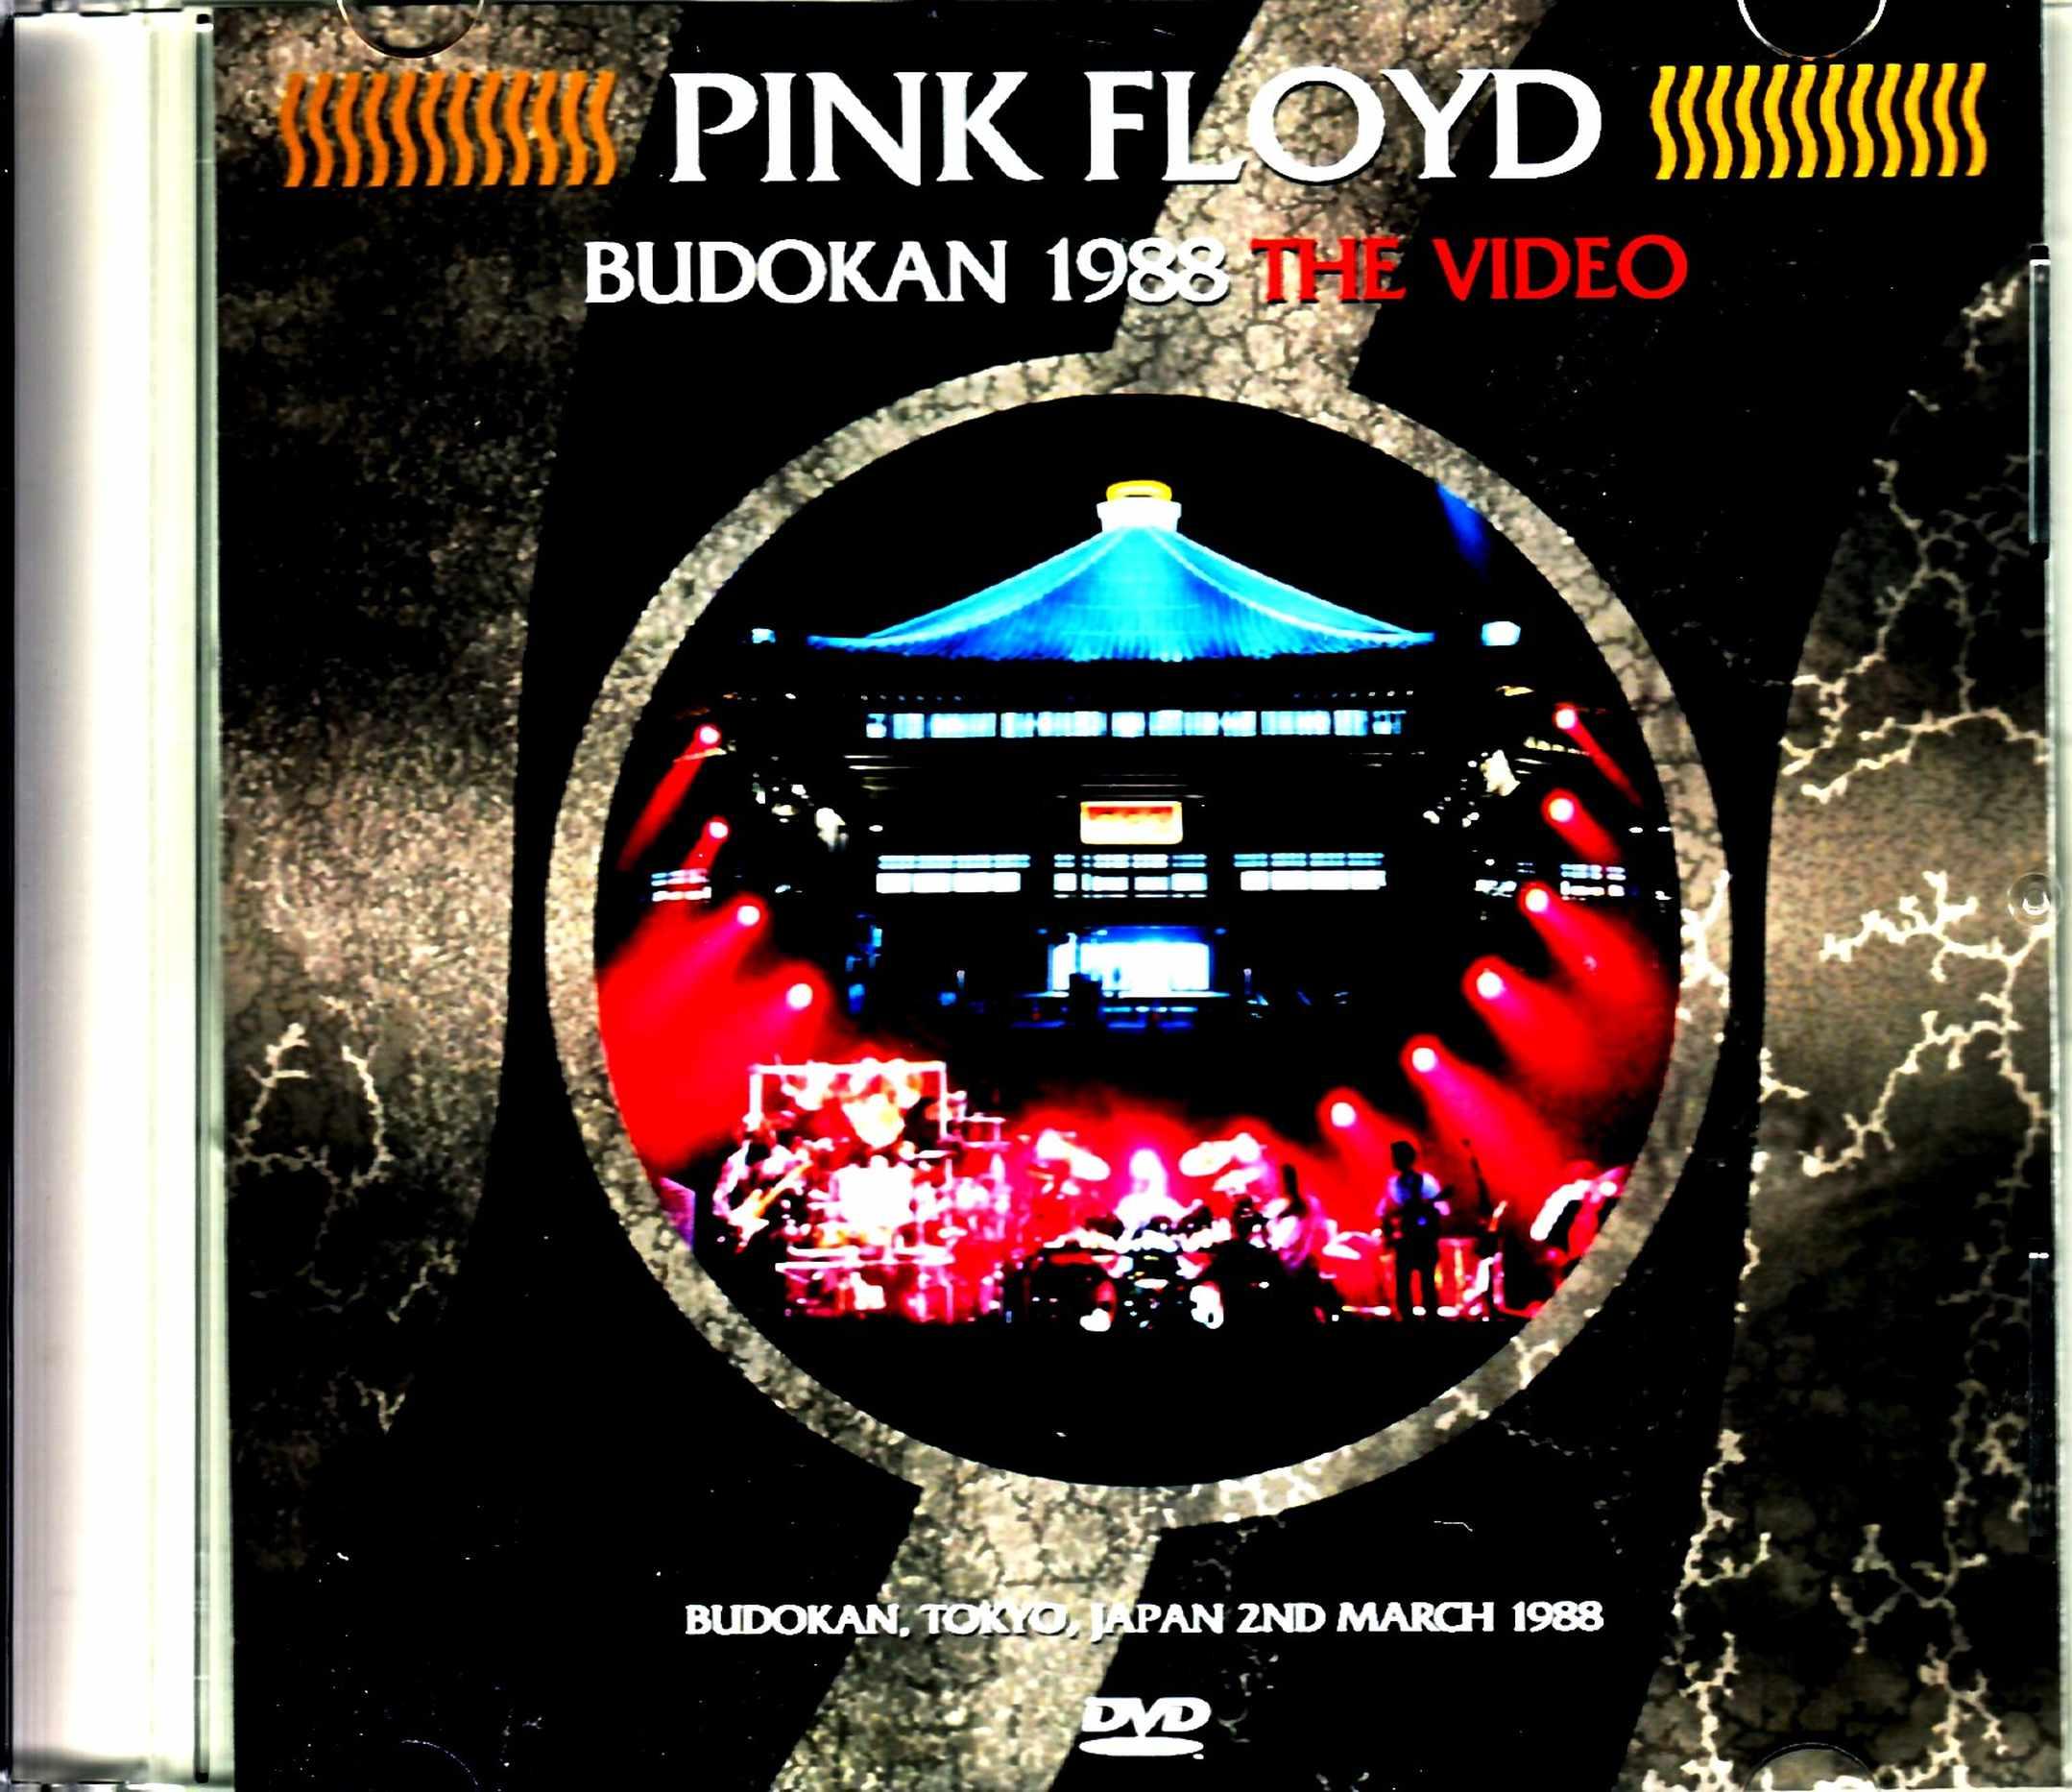 Pink Floyd ピンク・フロイド/Tokyo,Japan 3.2.1988